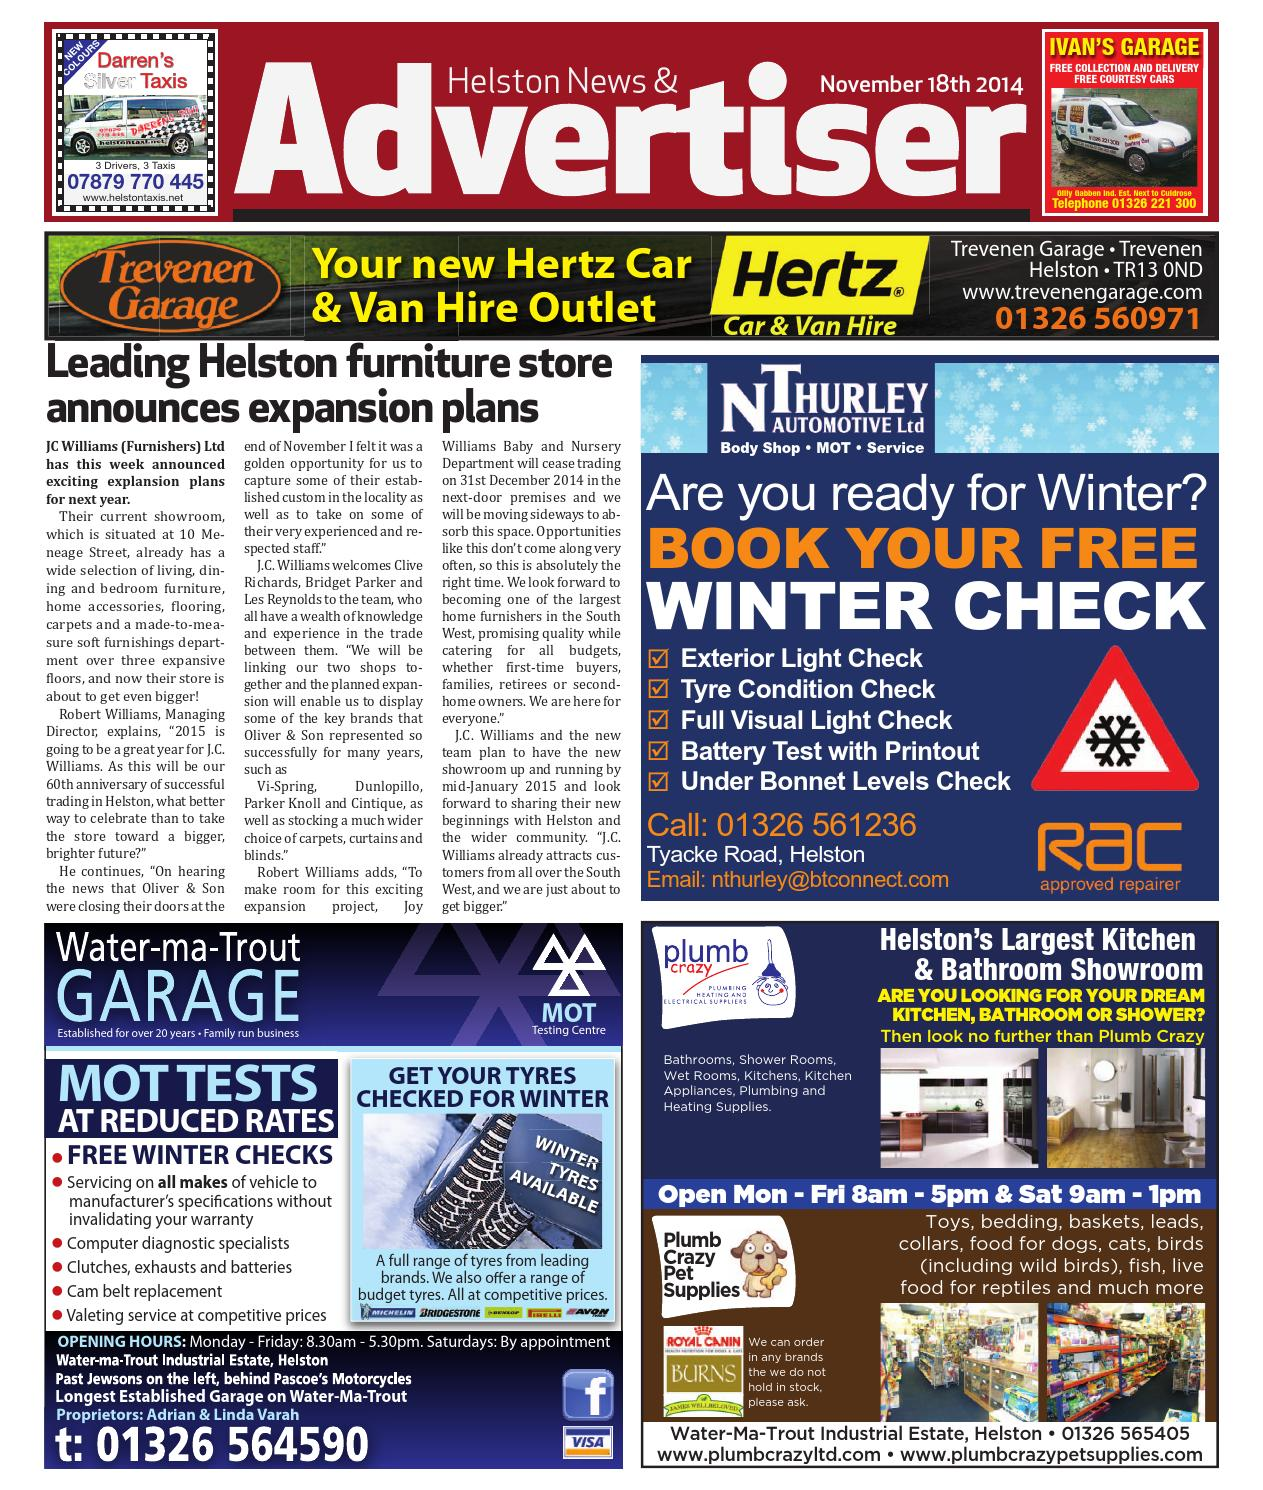 Helston news advertiser 18th november 2014 by helston advertiser helston news advertiser 18th november 2014 by helston advertiser issuu fandeluxe Choice Image